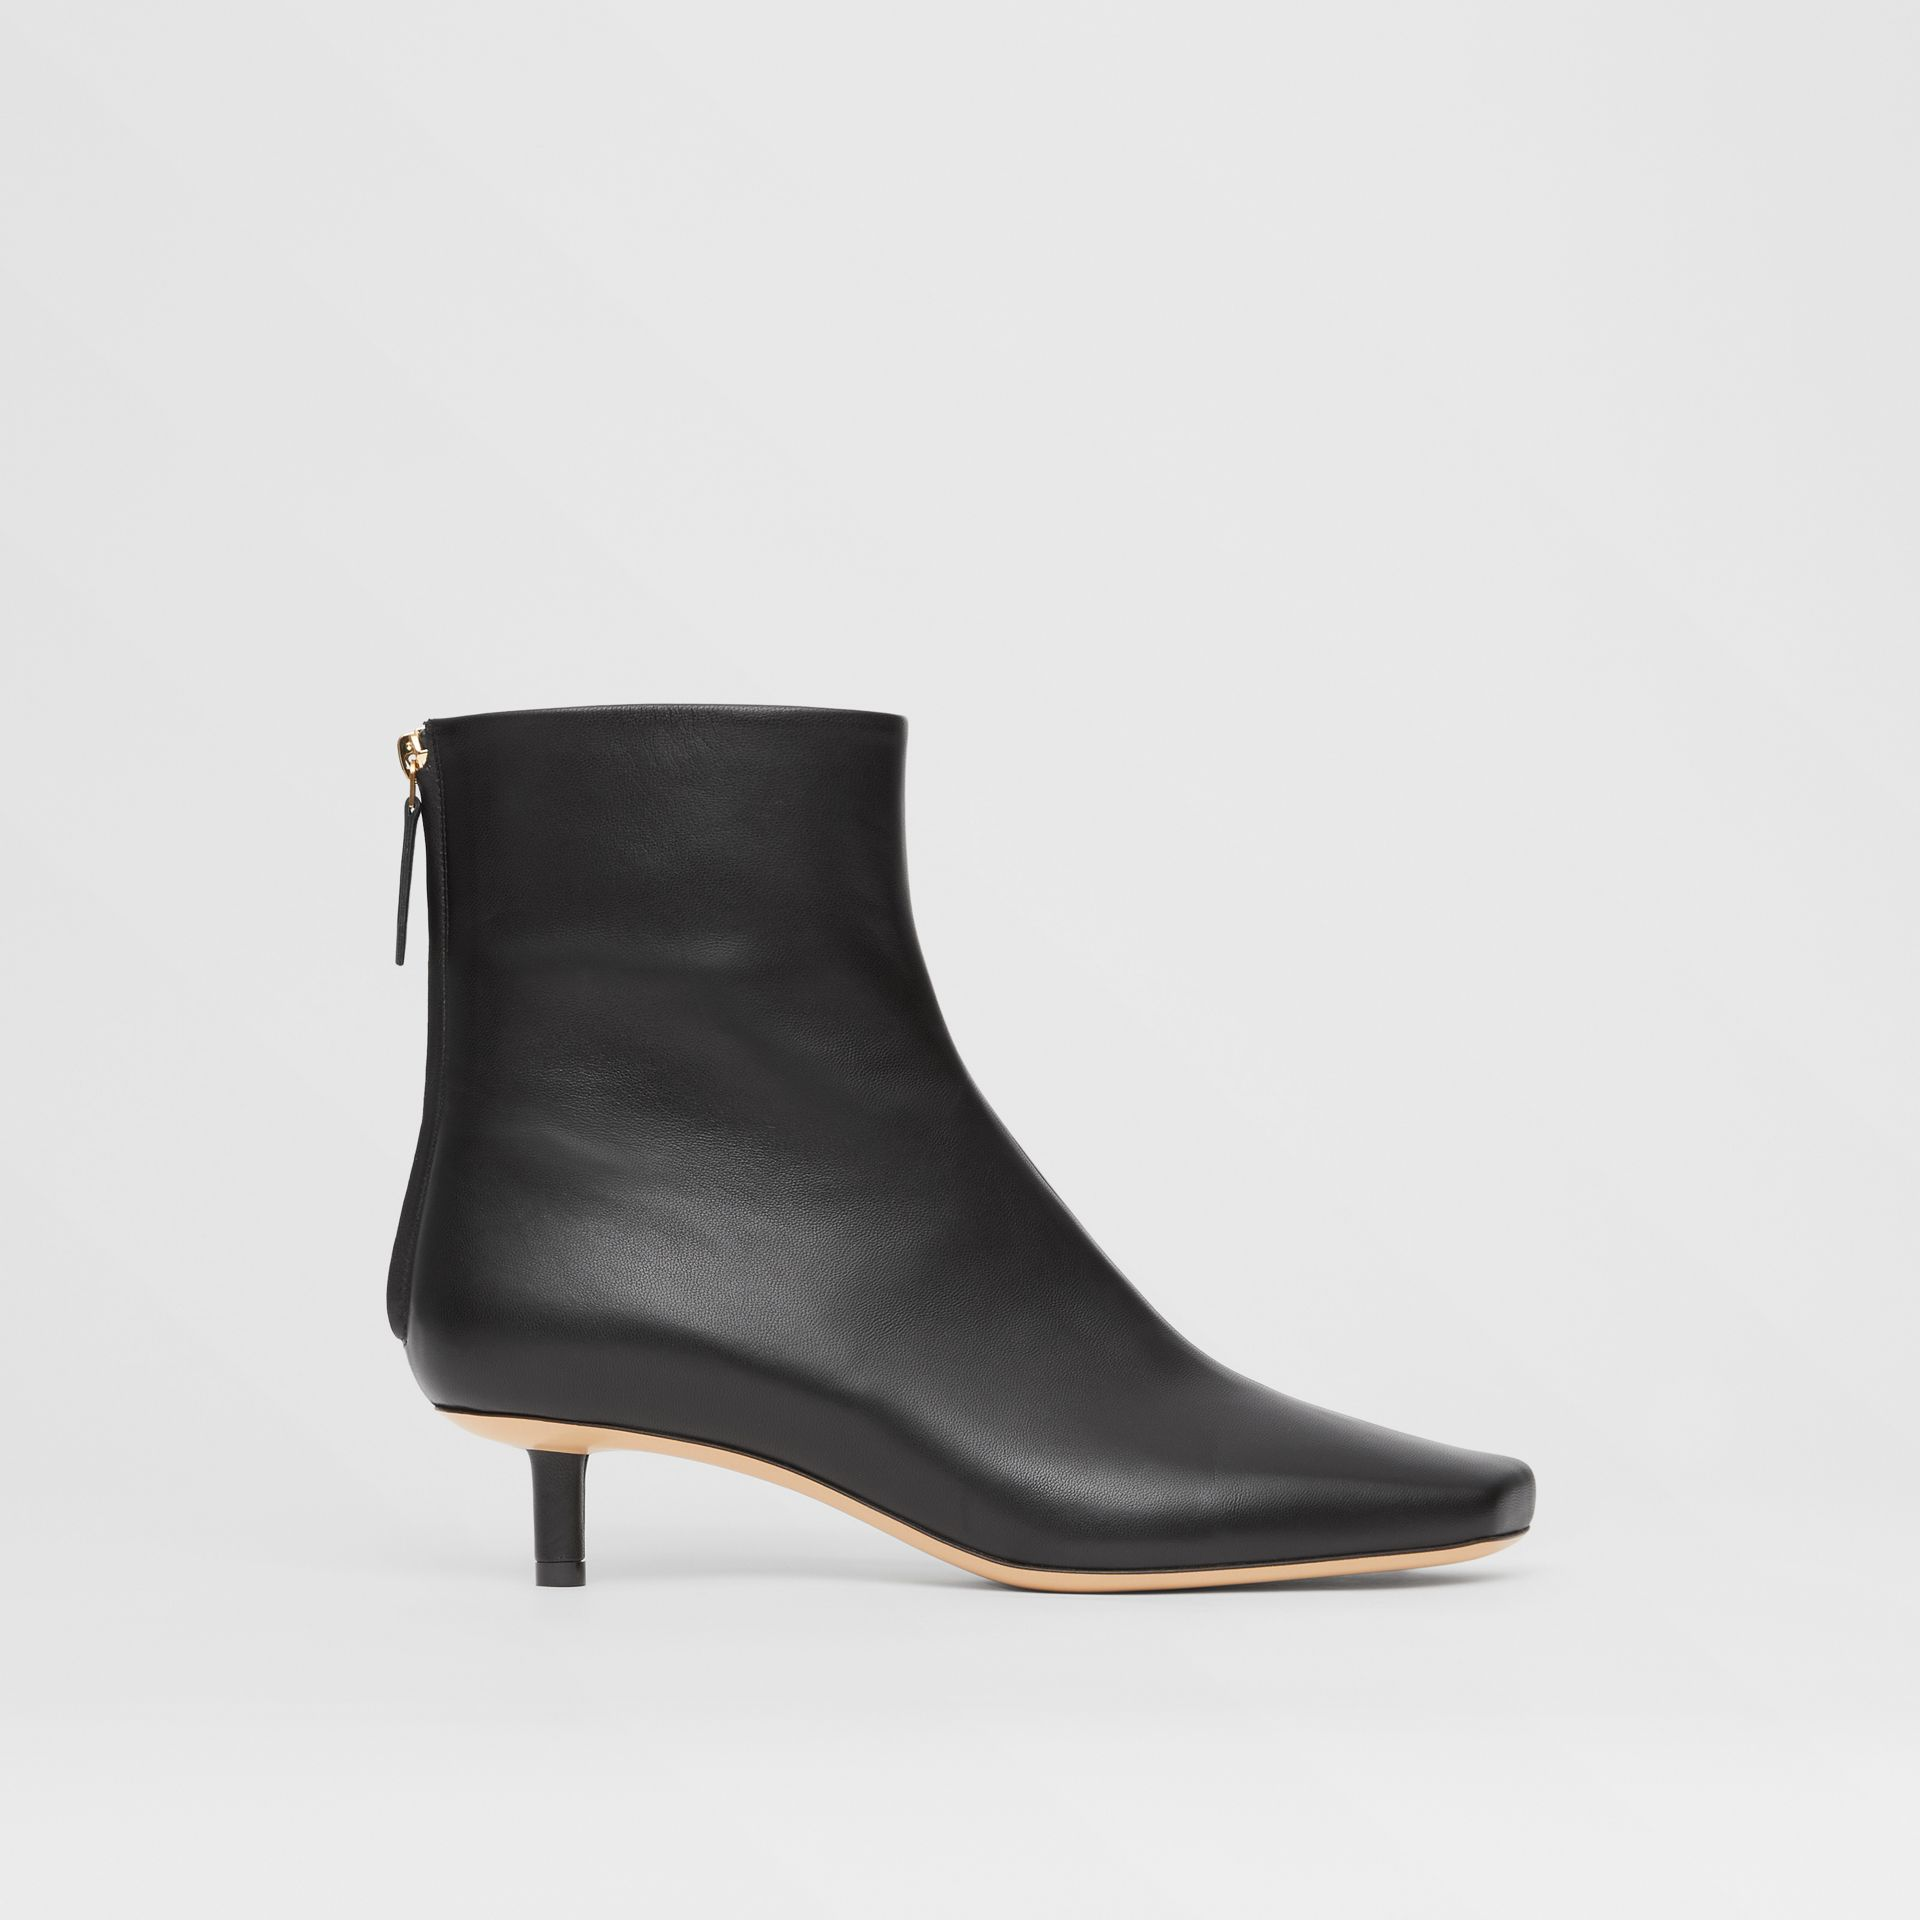 Lambskin Sculptural Kitten-heel Ankle Boots in Black - Women | Burberry - gallery image 5